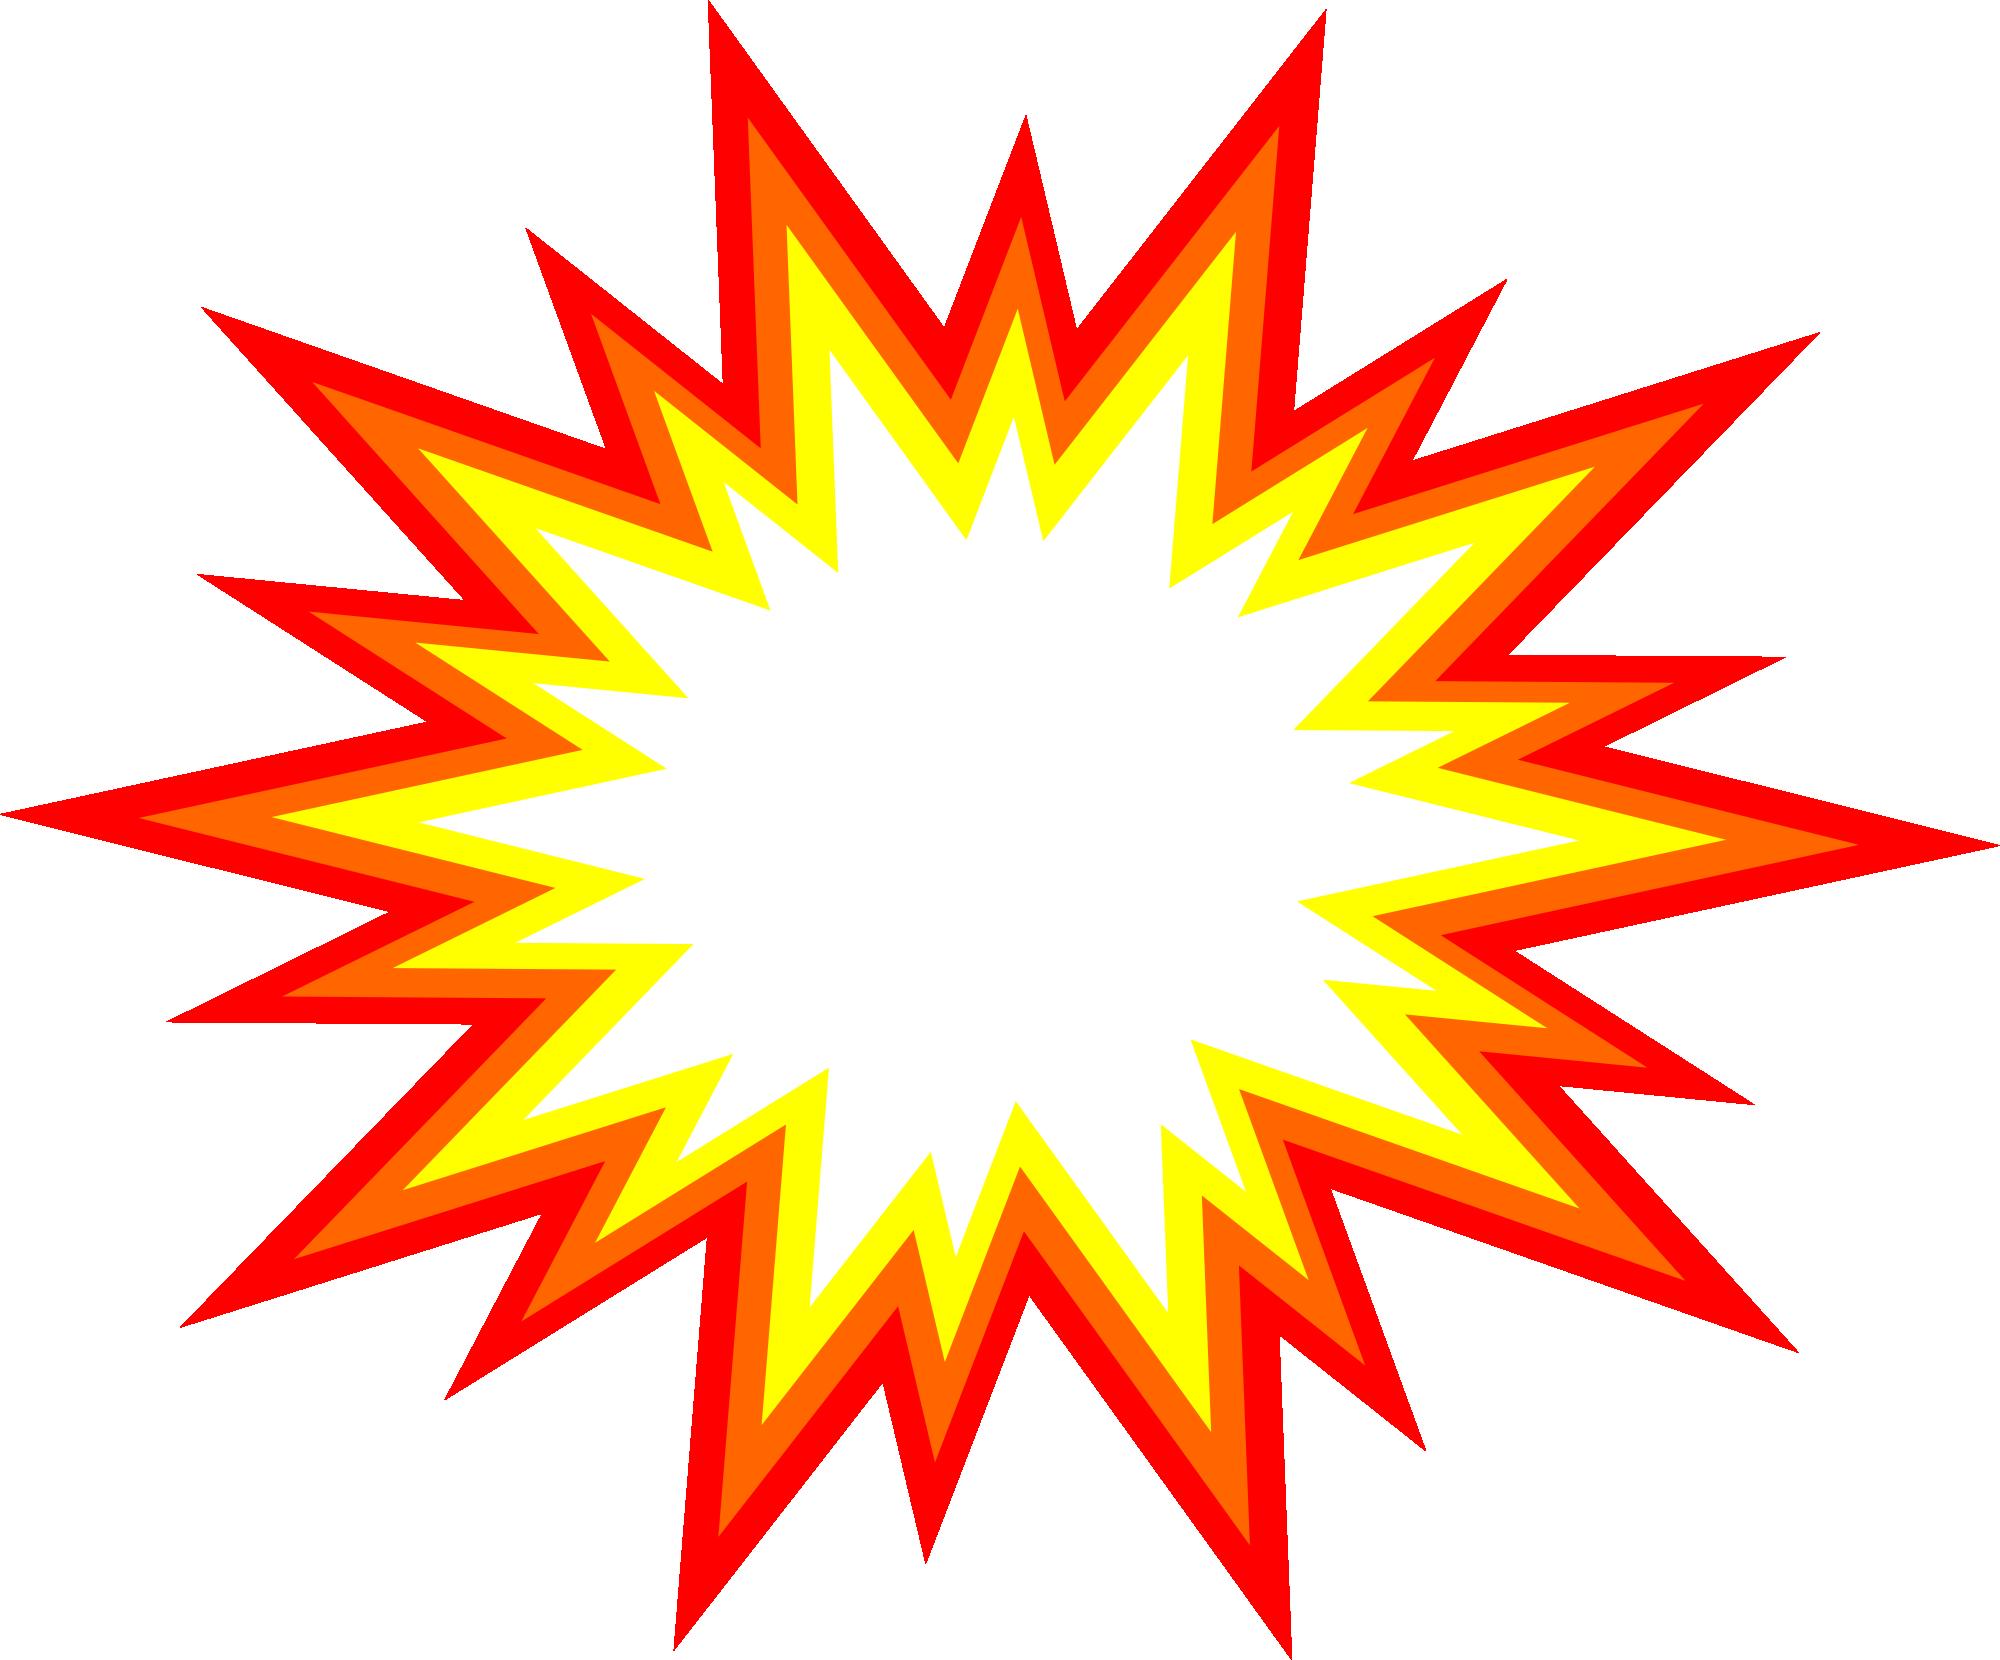 Star brust clipart banner free download 6 Starburst Explosion Comic Vector (PNG Transparent, SVG)   OnlyGFX.com banner free download